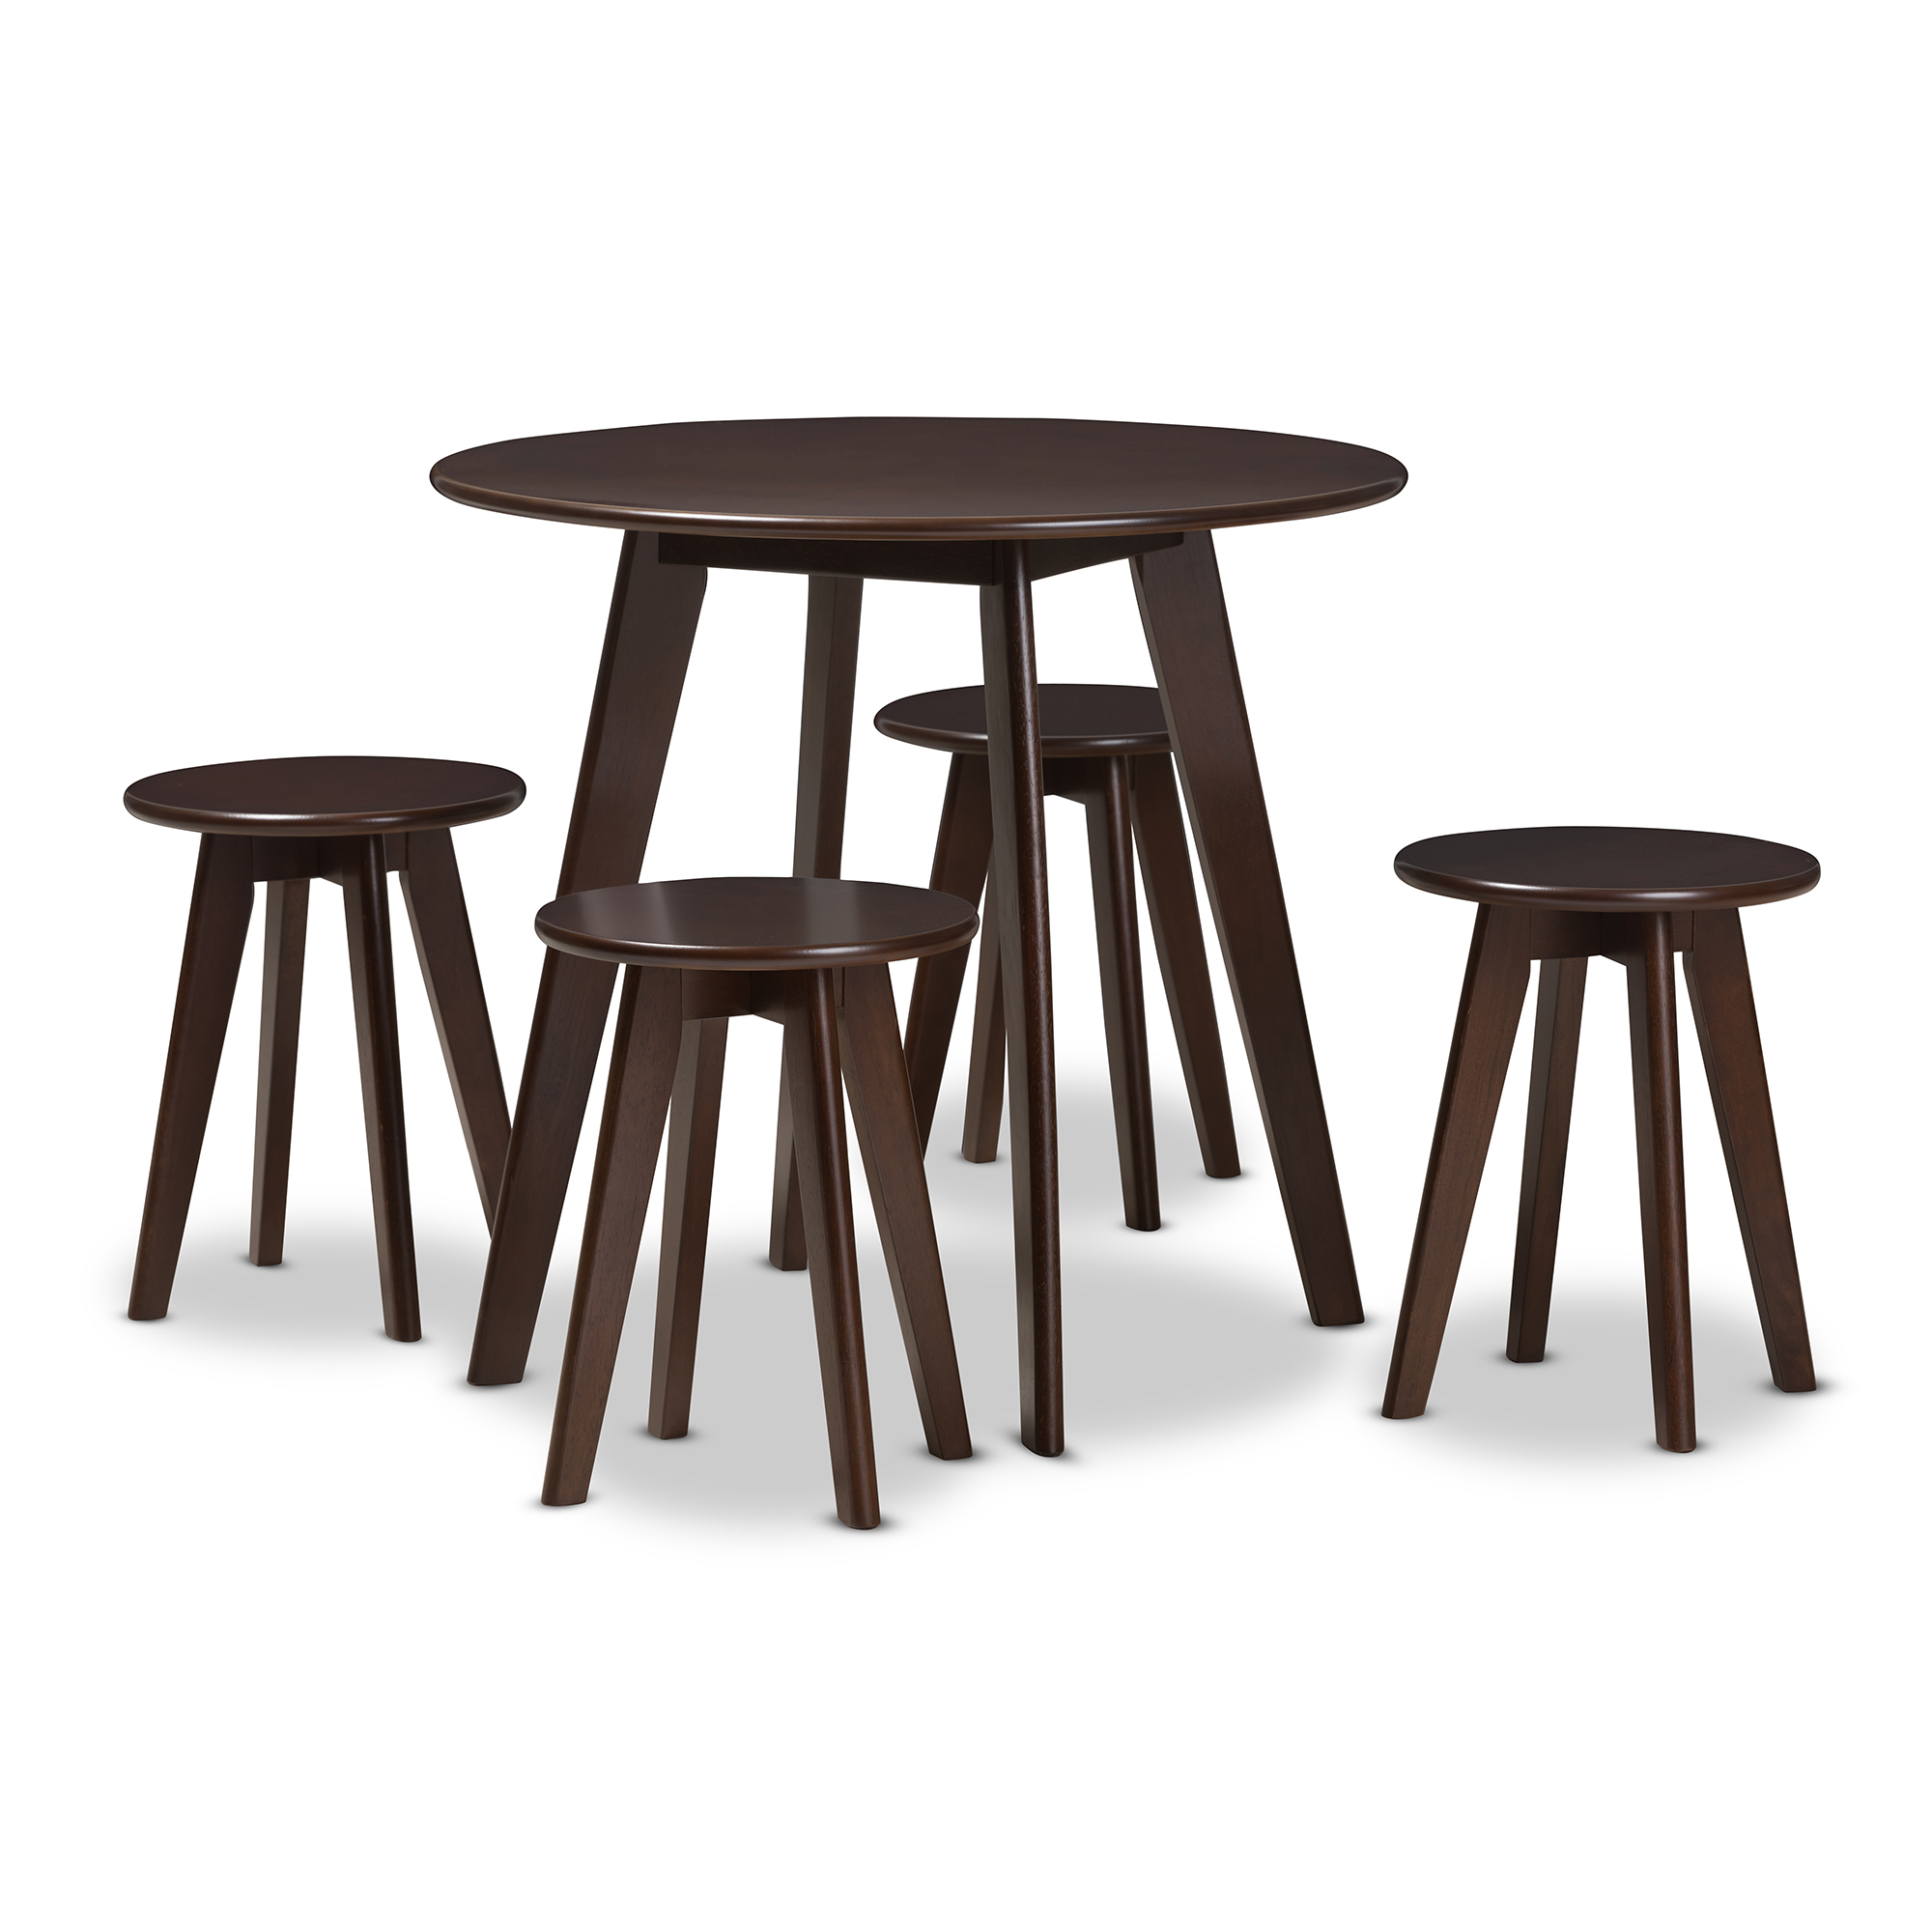 Baxton Studio Zula Mid Century Modern Walnut Wood 5 Piece Dining Set  Affordable Modern